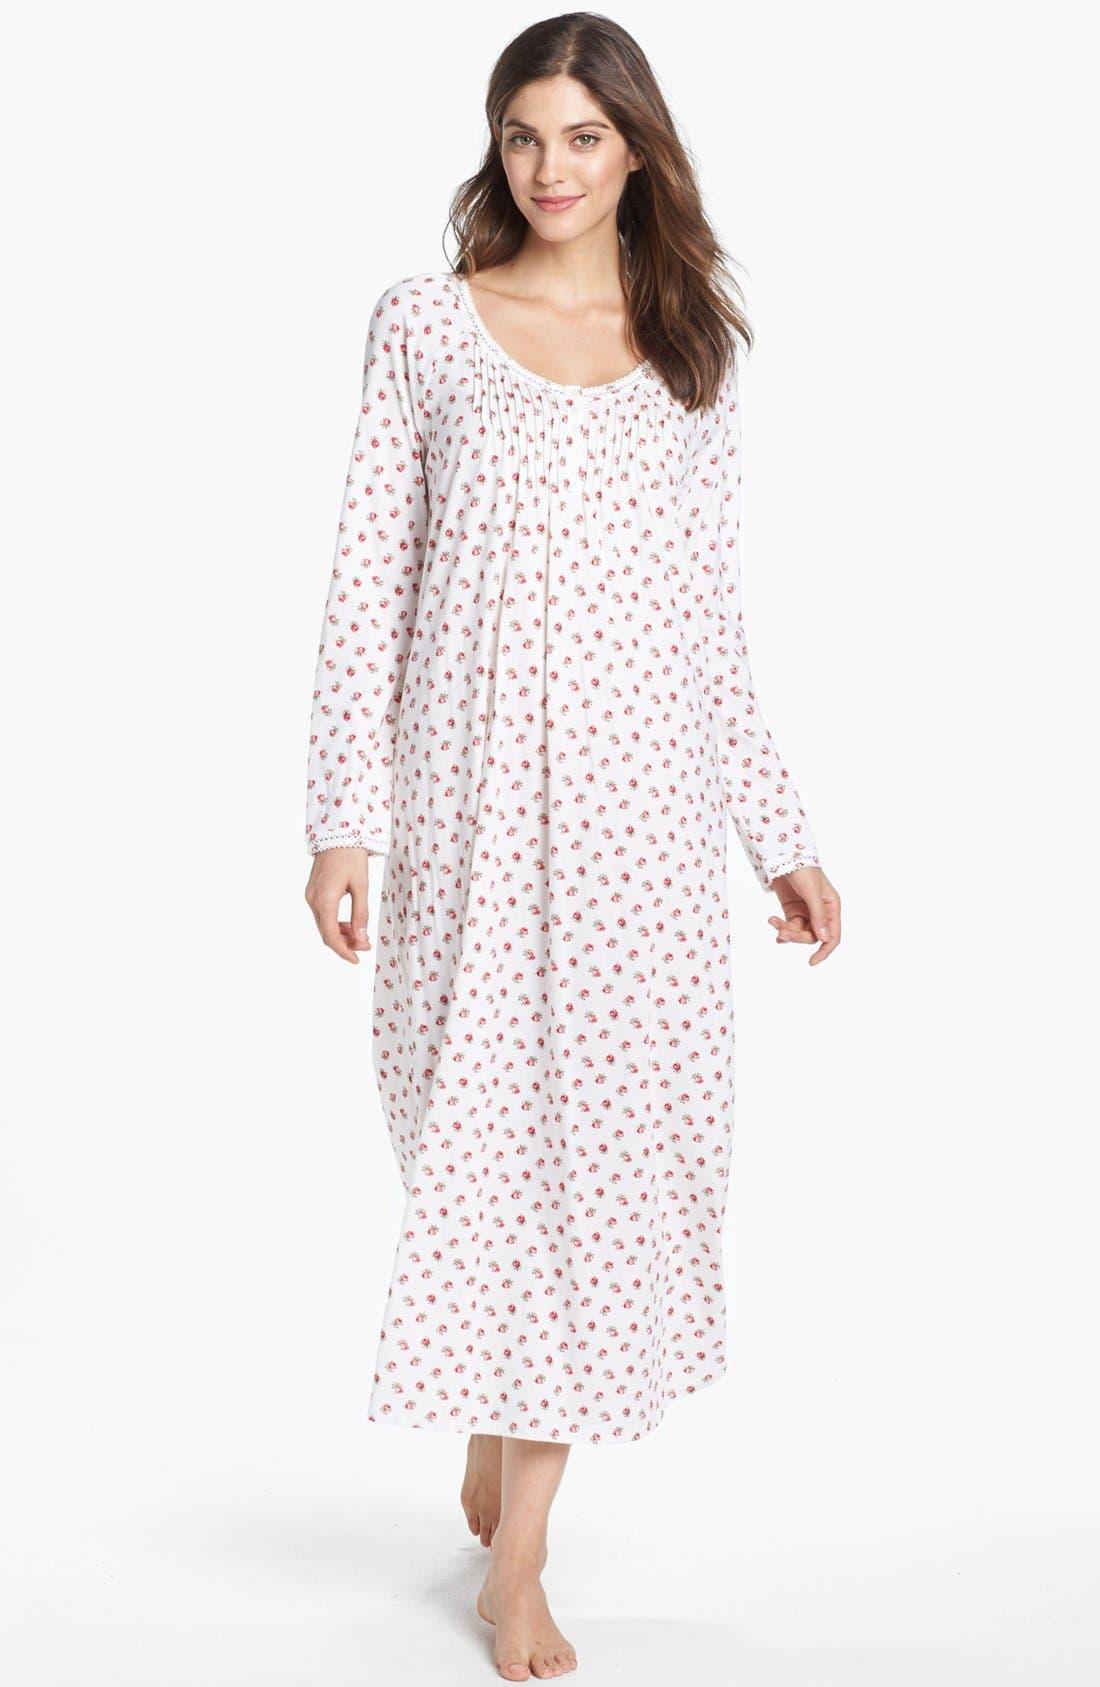 Alternate Image 1 Selected - Carole Hochman Designs 'Rosebud Cherubs' Nightgown